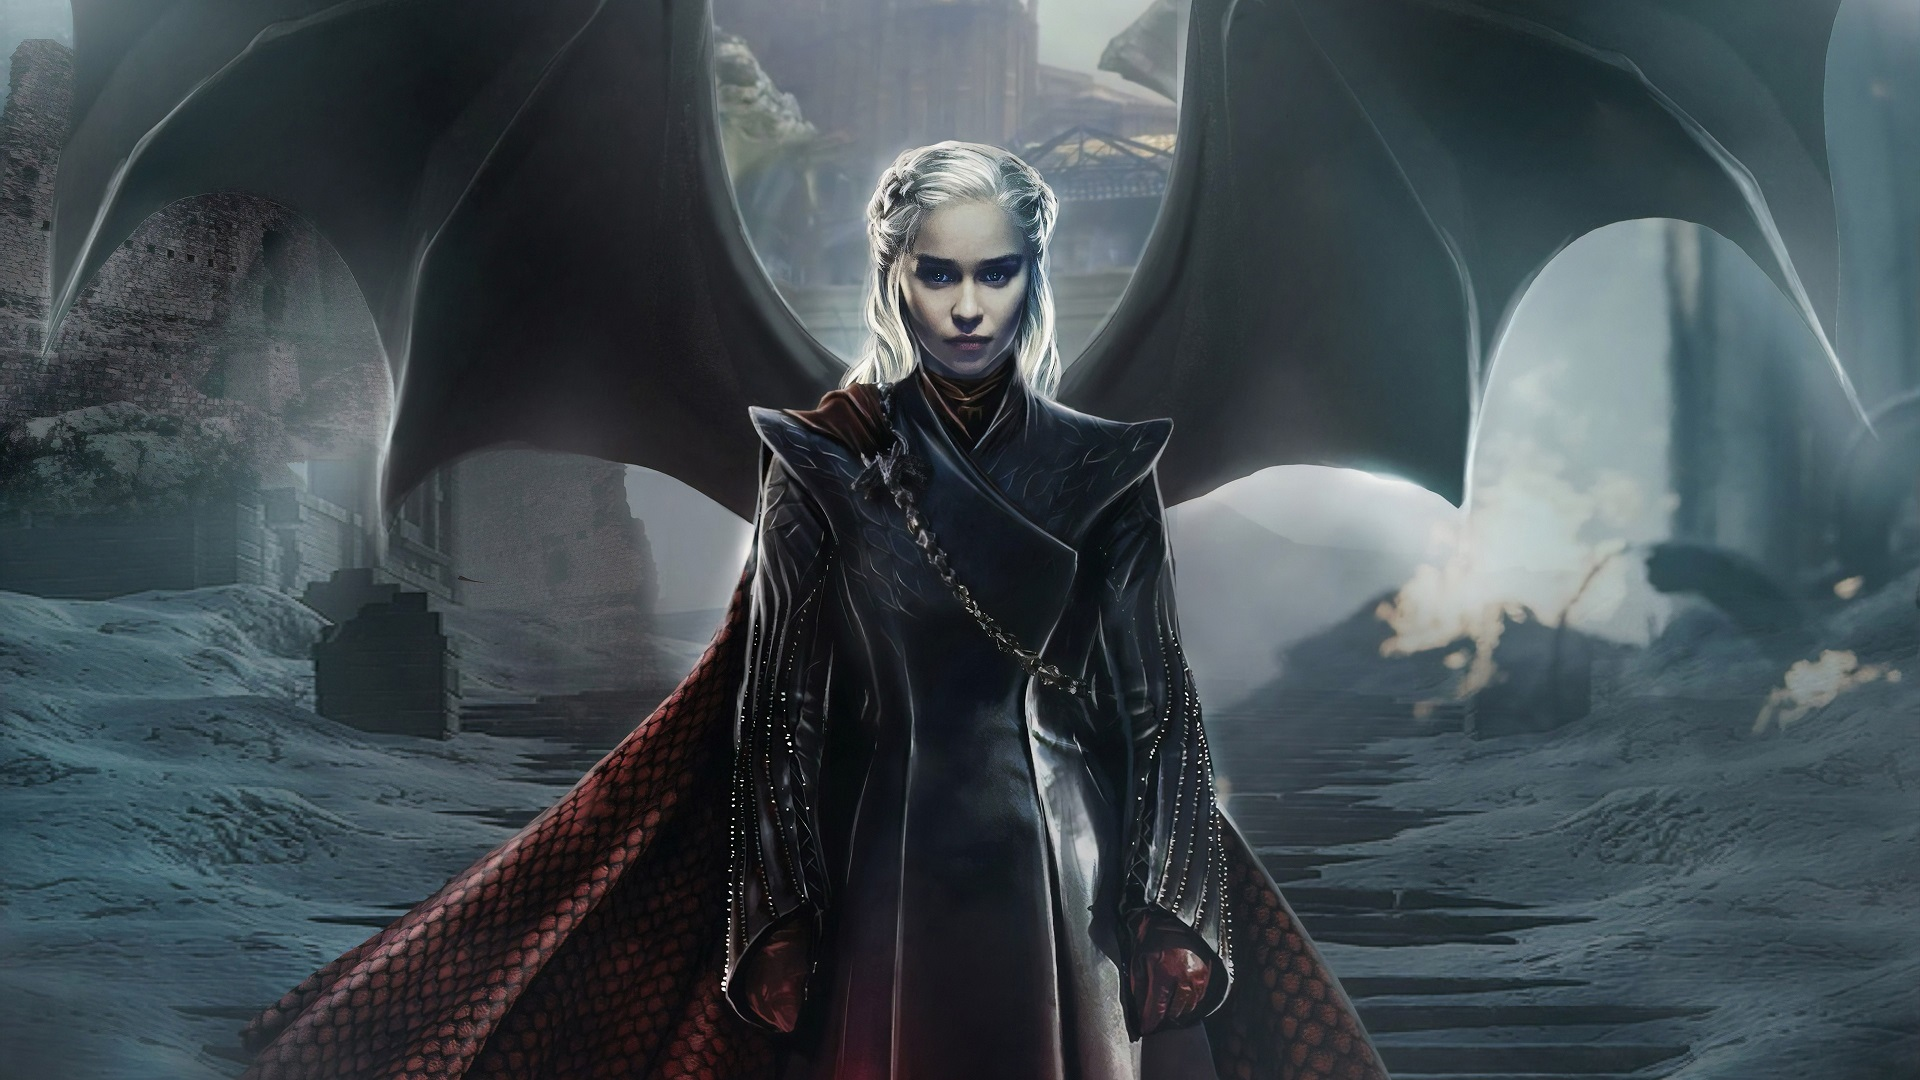 General 1920x1080 women Emilia Clarke Daenerys Targaryen Game of Thrones dragon wings TV silver hair artwork fantasy art